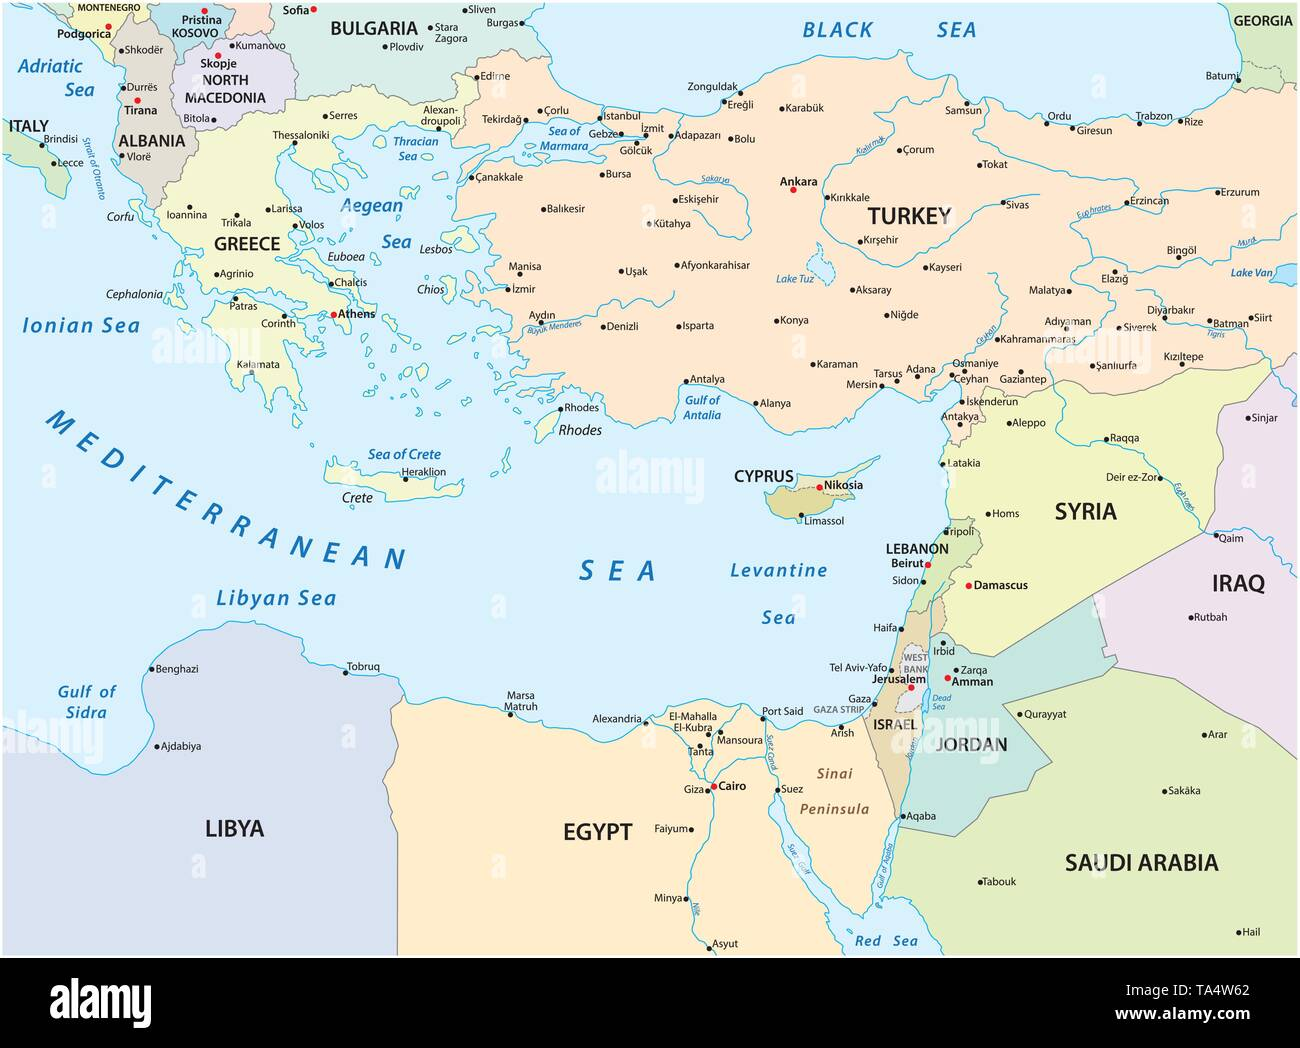 Cartina Geografica Mediterraneo Orientale.Mappa Mediterranea Immagini E Fotos Stock Alamy